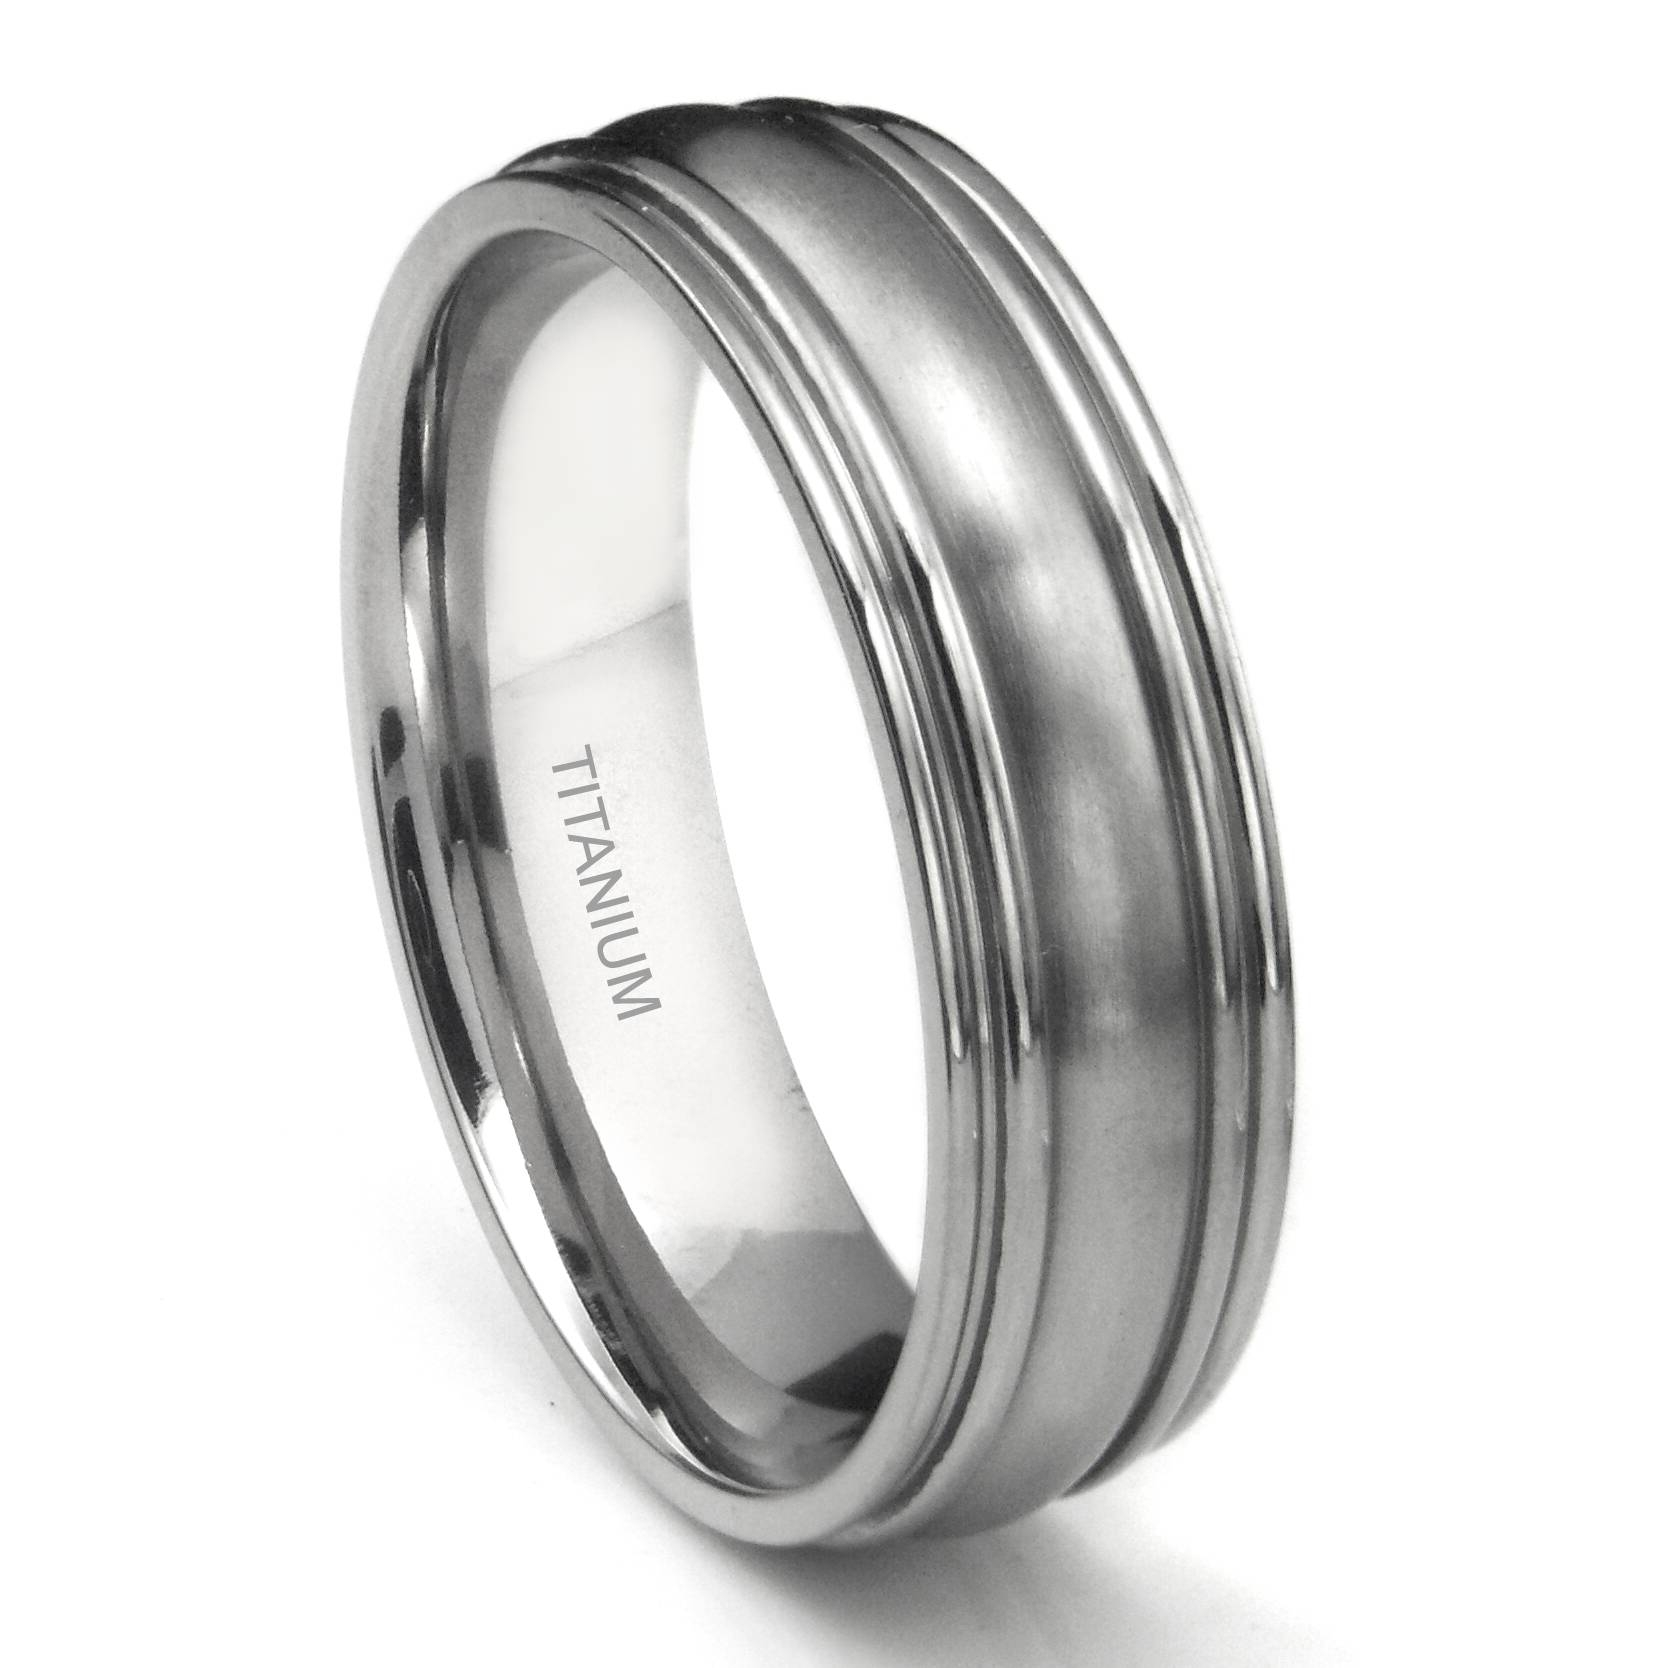 Titanium 7Mm Ribbed Men's Wedding Ring Within Titanium Men Wedding Rings (View 9 of 15)